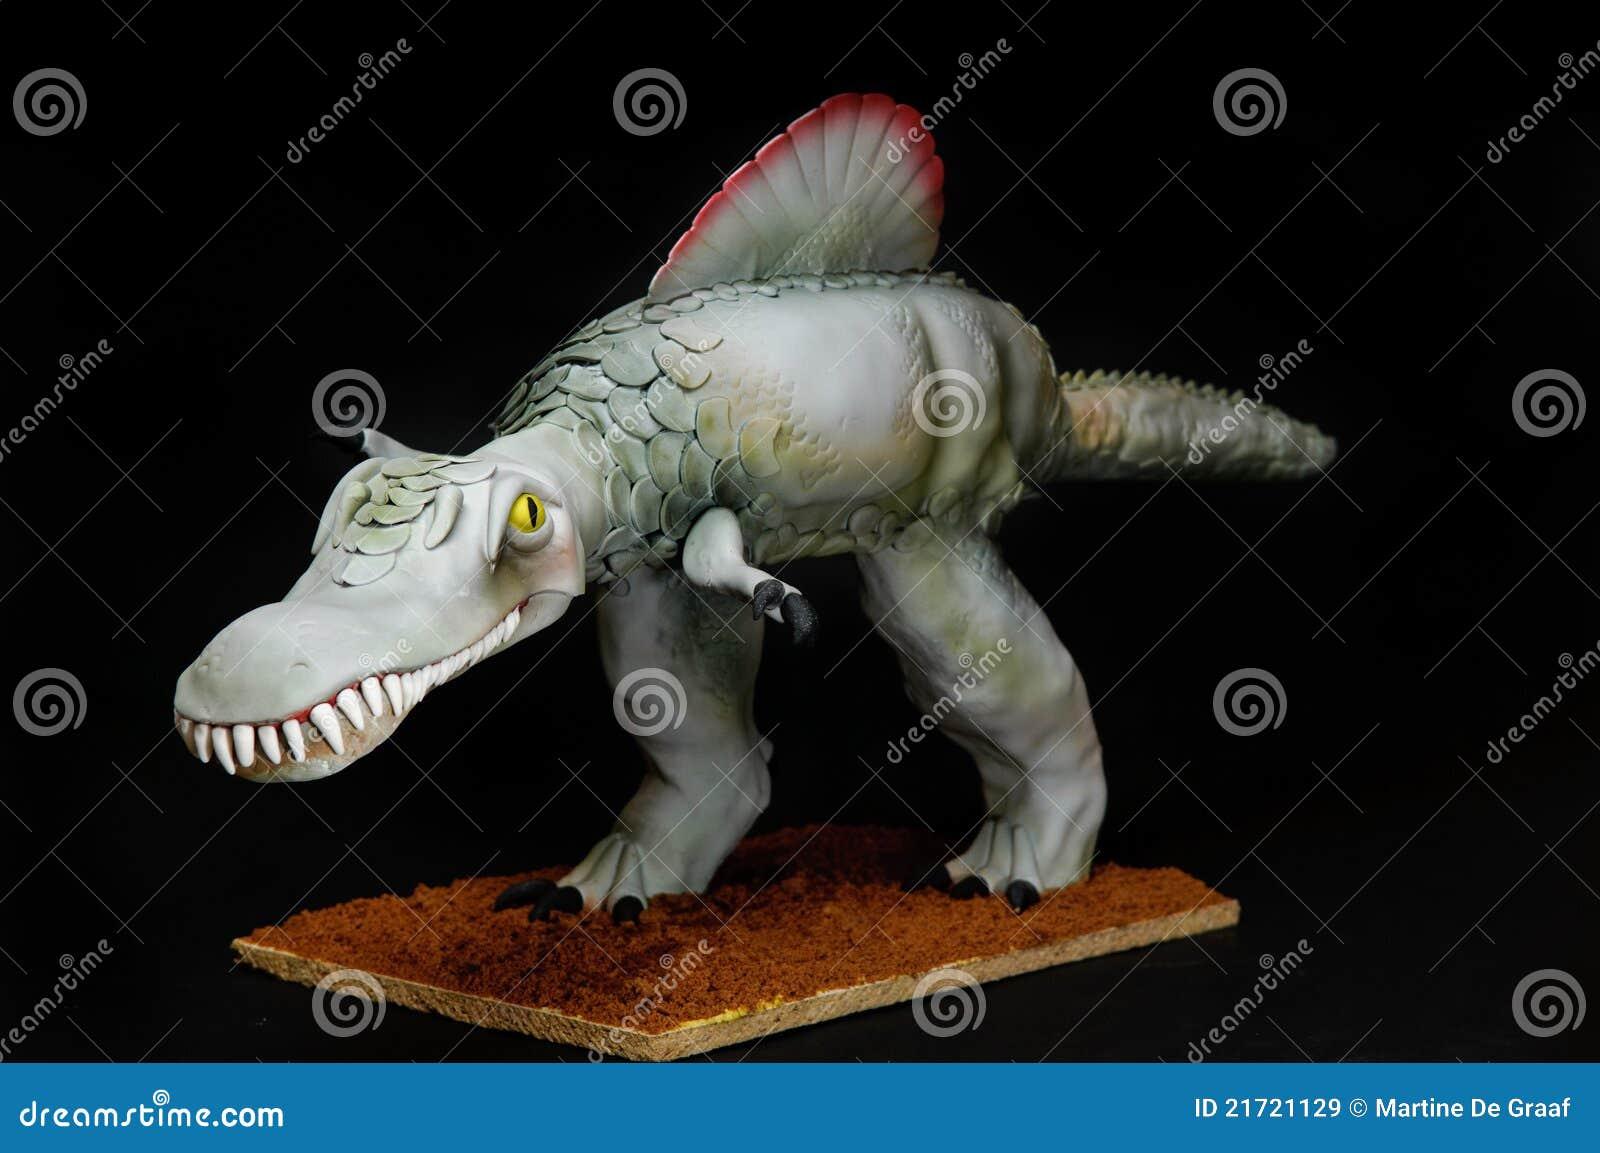 dinosaur cake royalty free stock images image 21721129